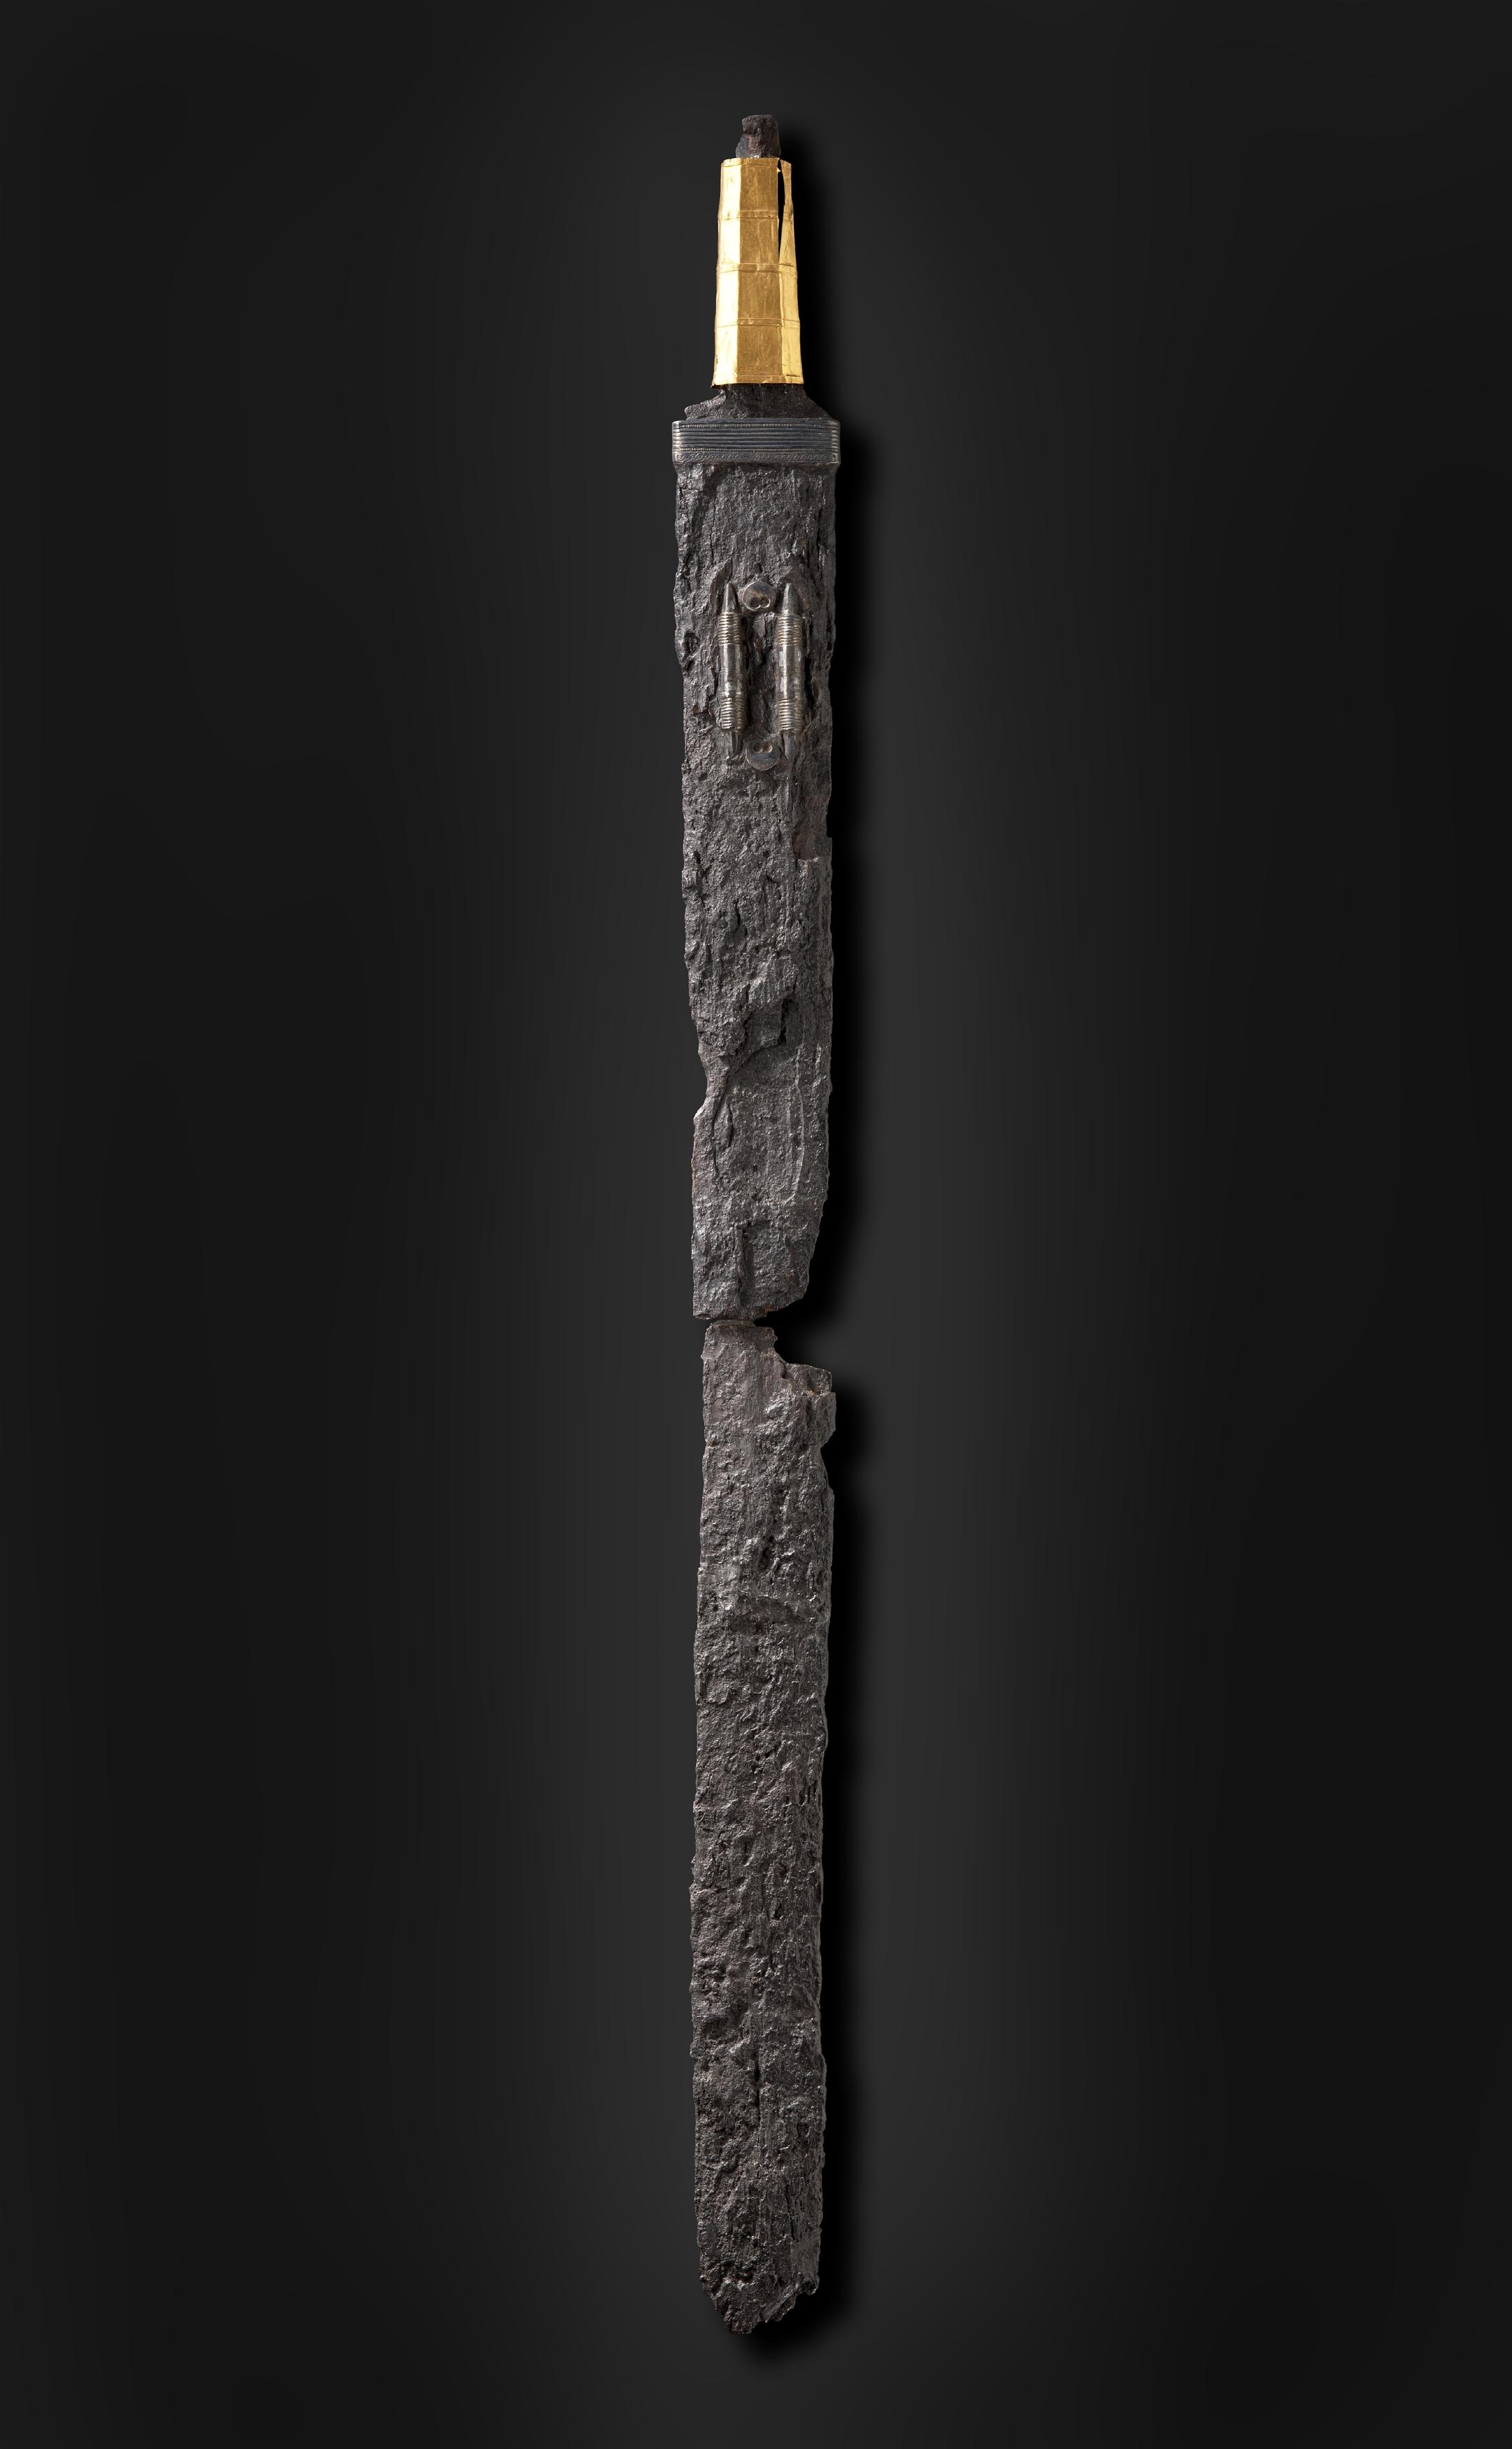 Goldgriffspatha aus Sindelfingen. 5./6. Jh. (c) Landesmuseum Württemberg, Stuttgart. Foto: Hendrik Zwietasch